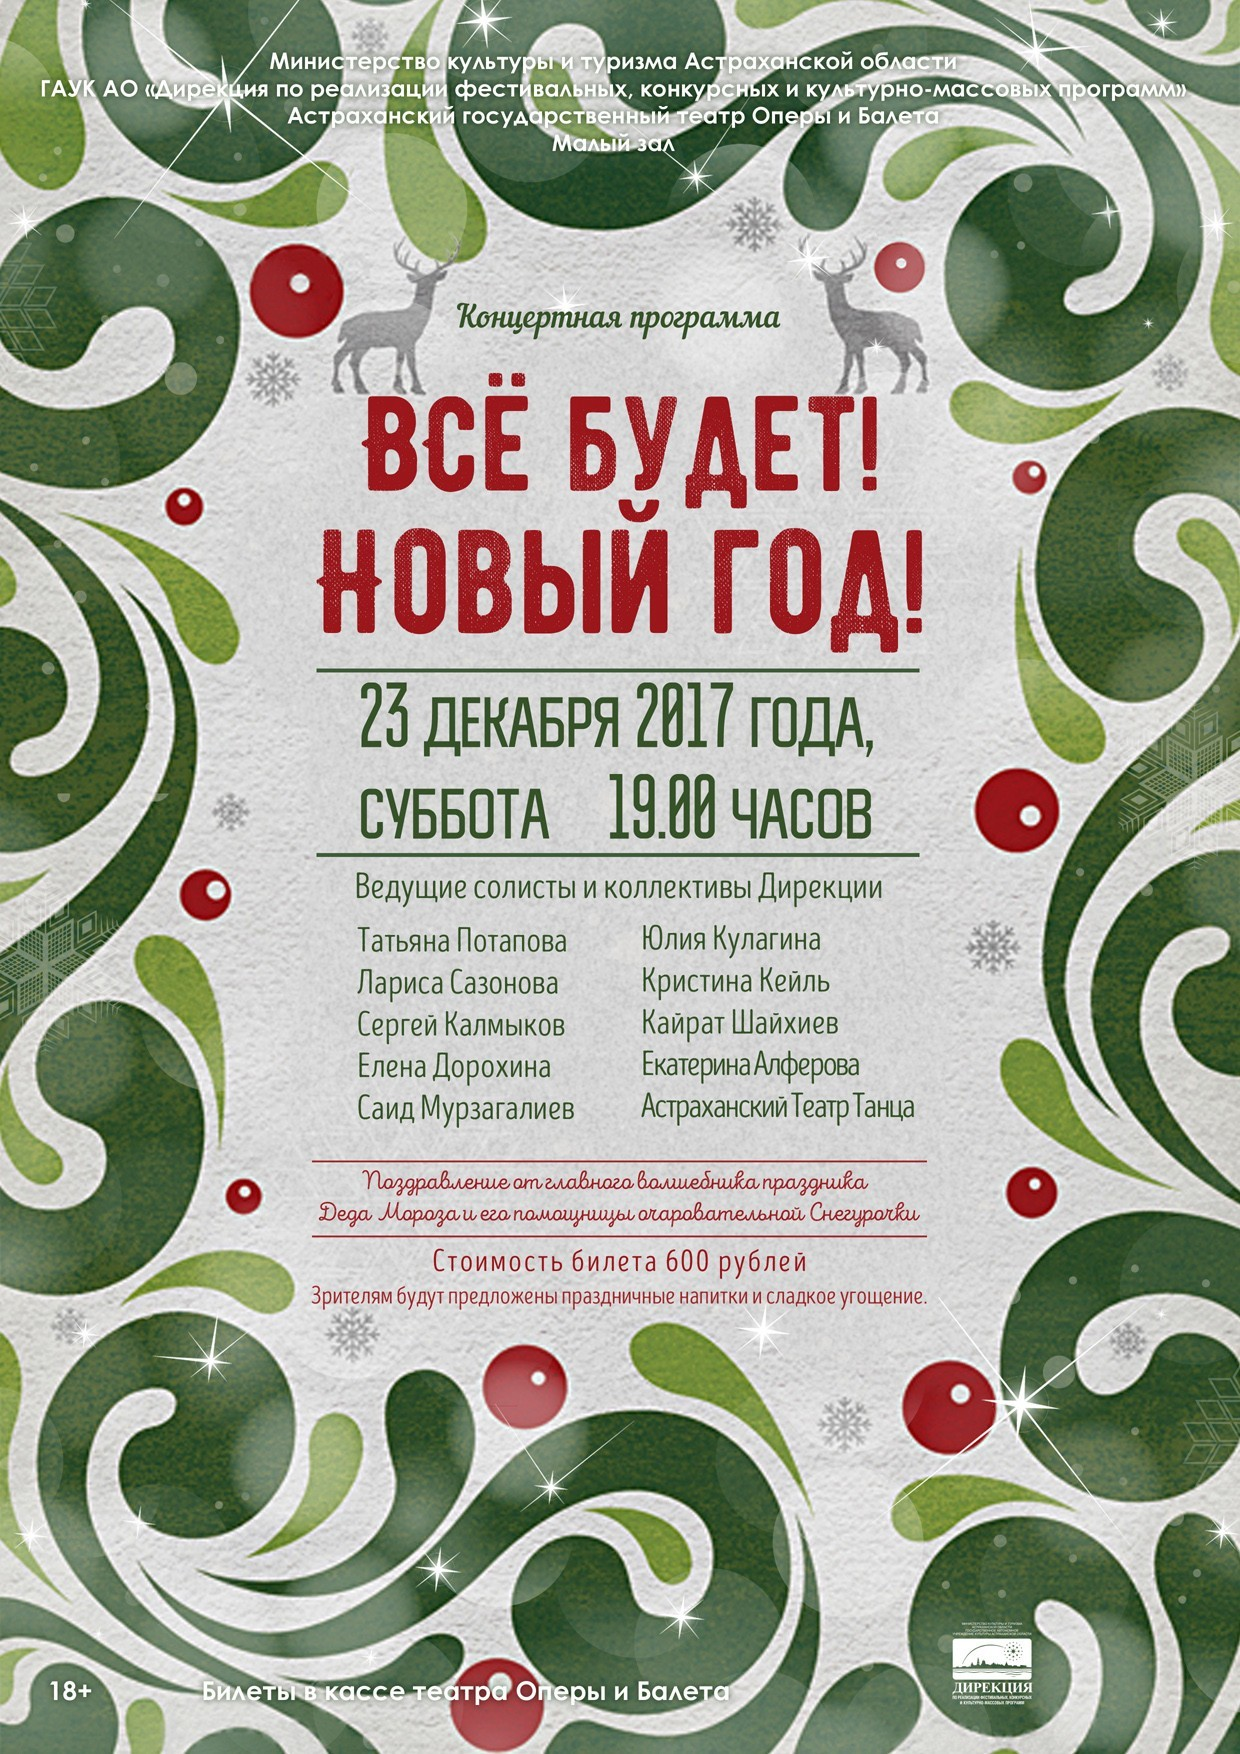 Астраханцев приглашают на предпраздничную концертную программу